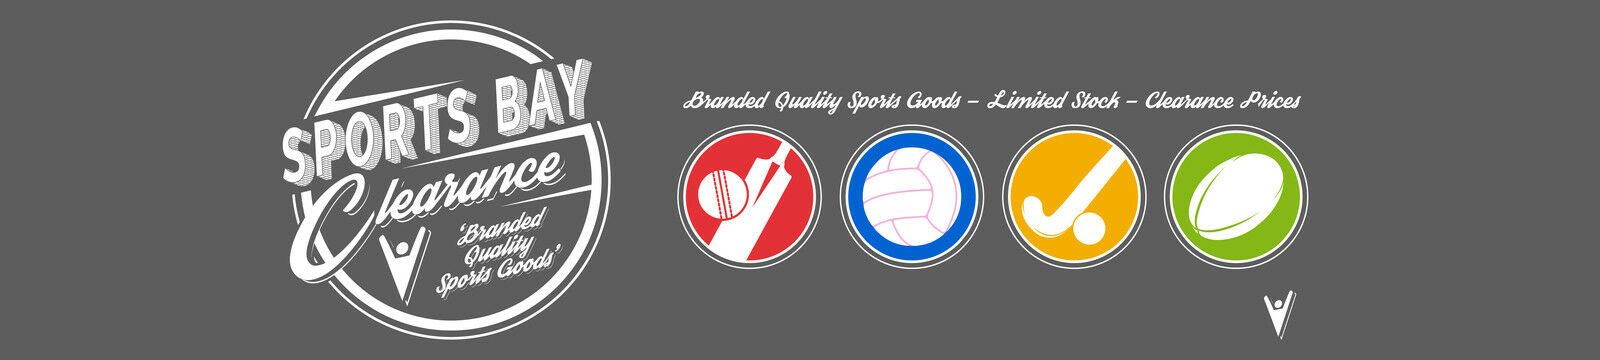 Sports-Bay-Cearance